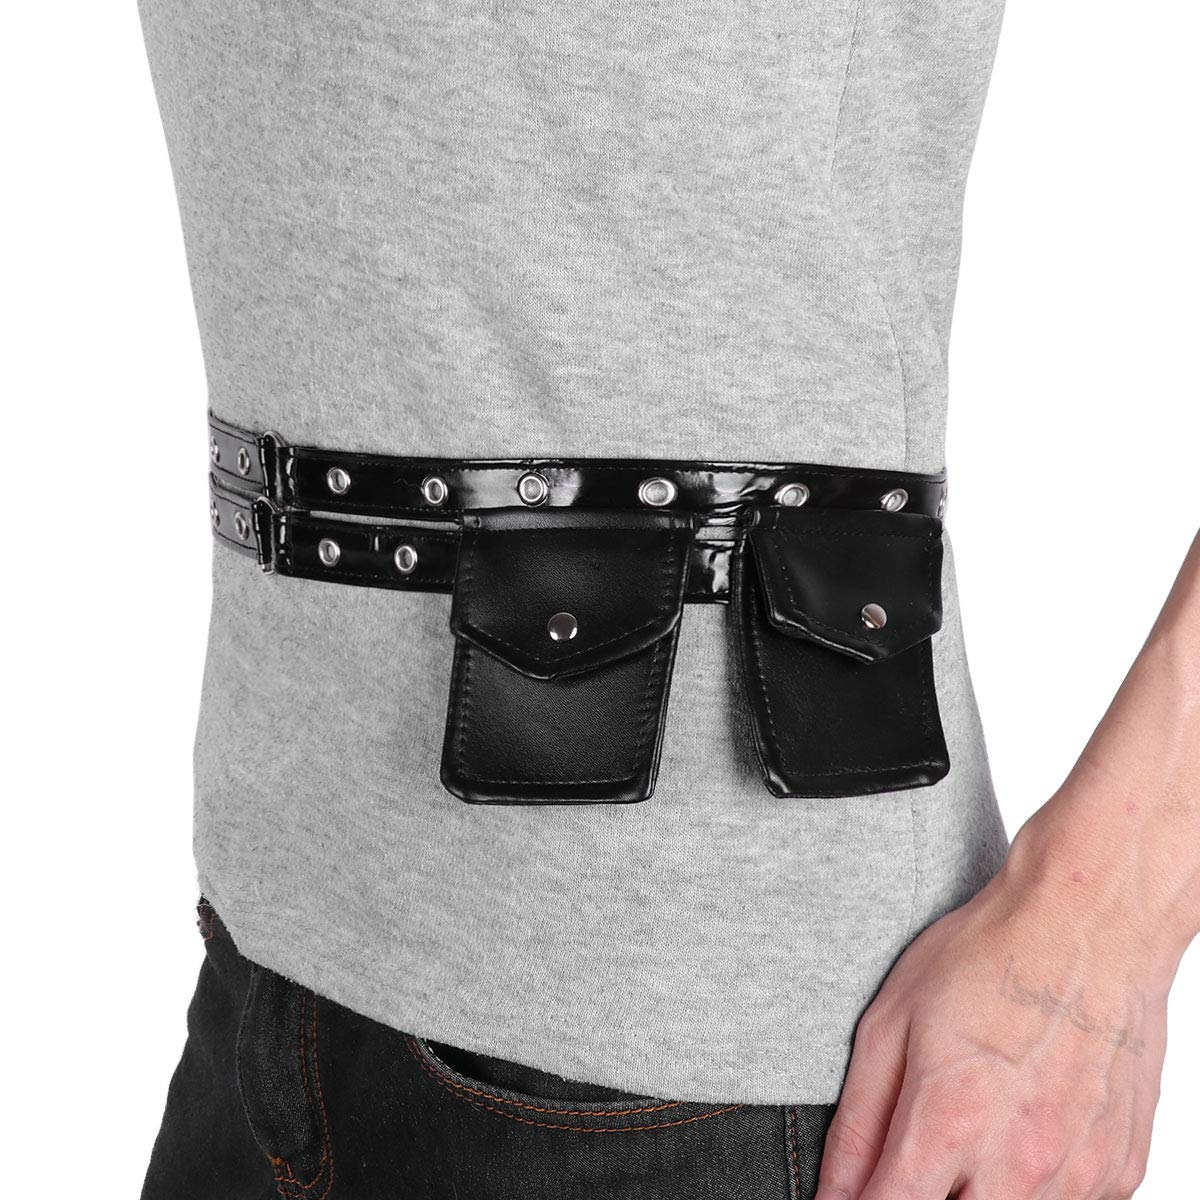 IEFIEL Fashion Steampunk Waist Fanny Pack Bag Corset Belt Costume Accessories Black One Size